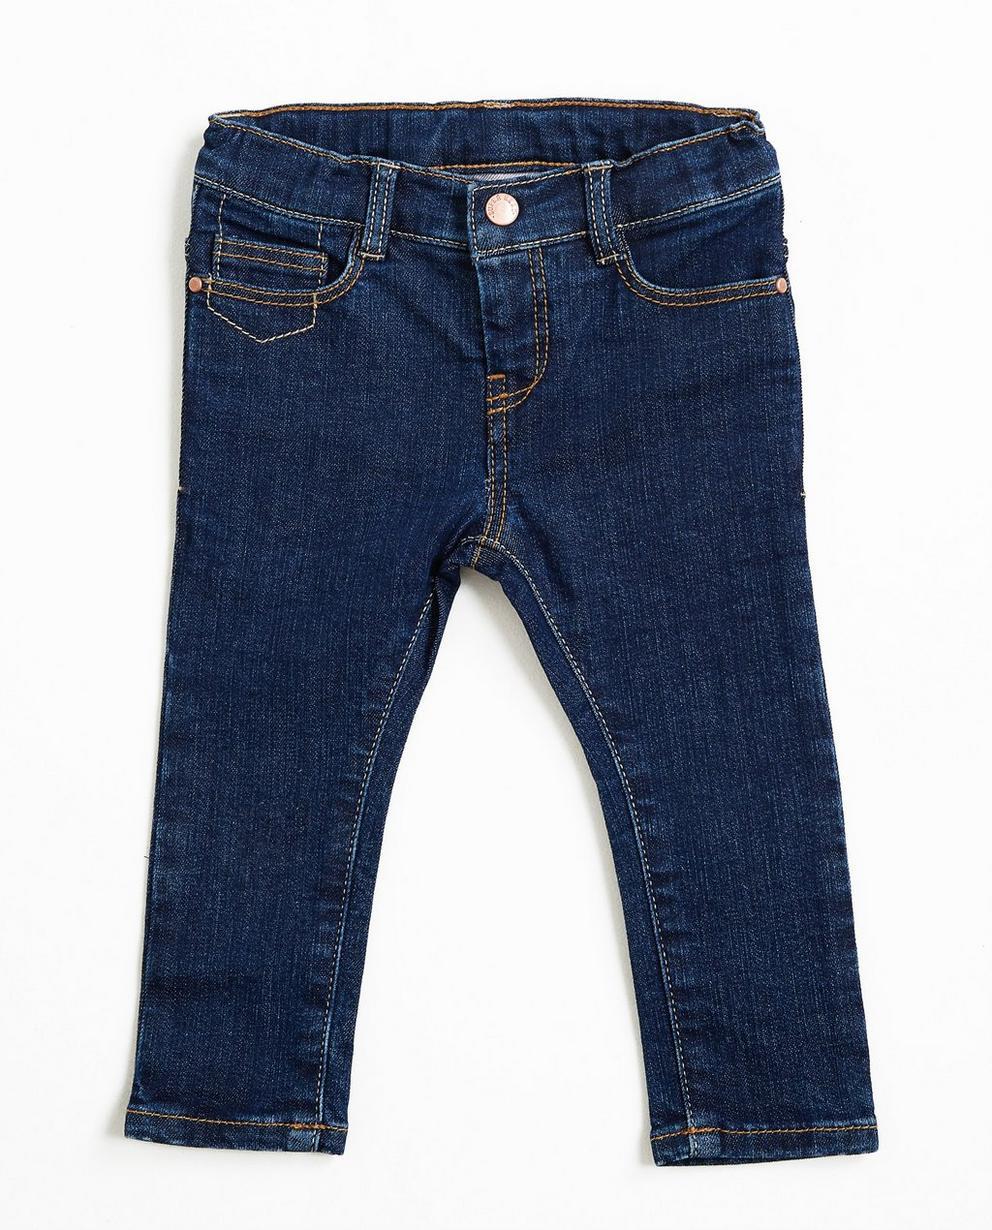 Dunkelblaue Slim-Jeans - Dry Denim - JBC